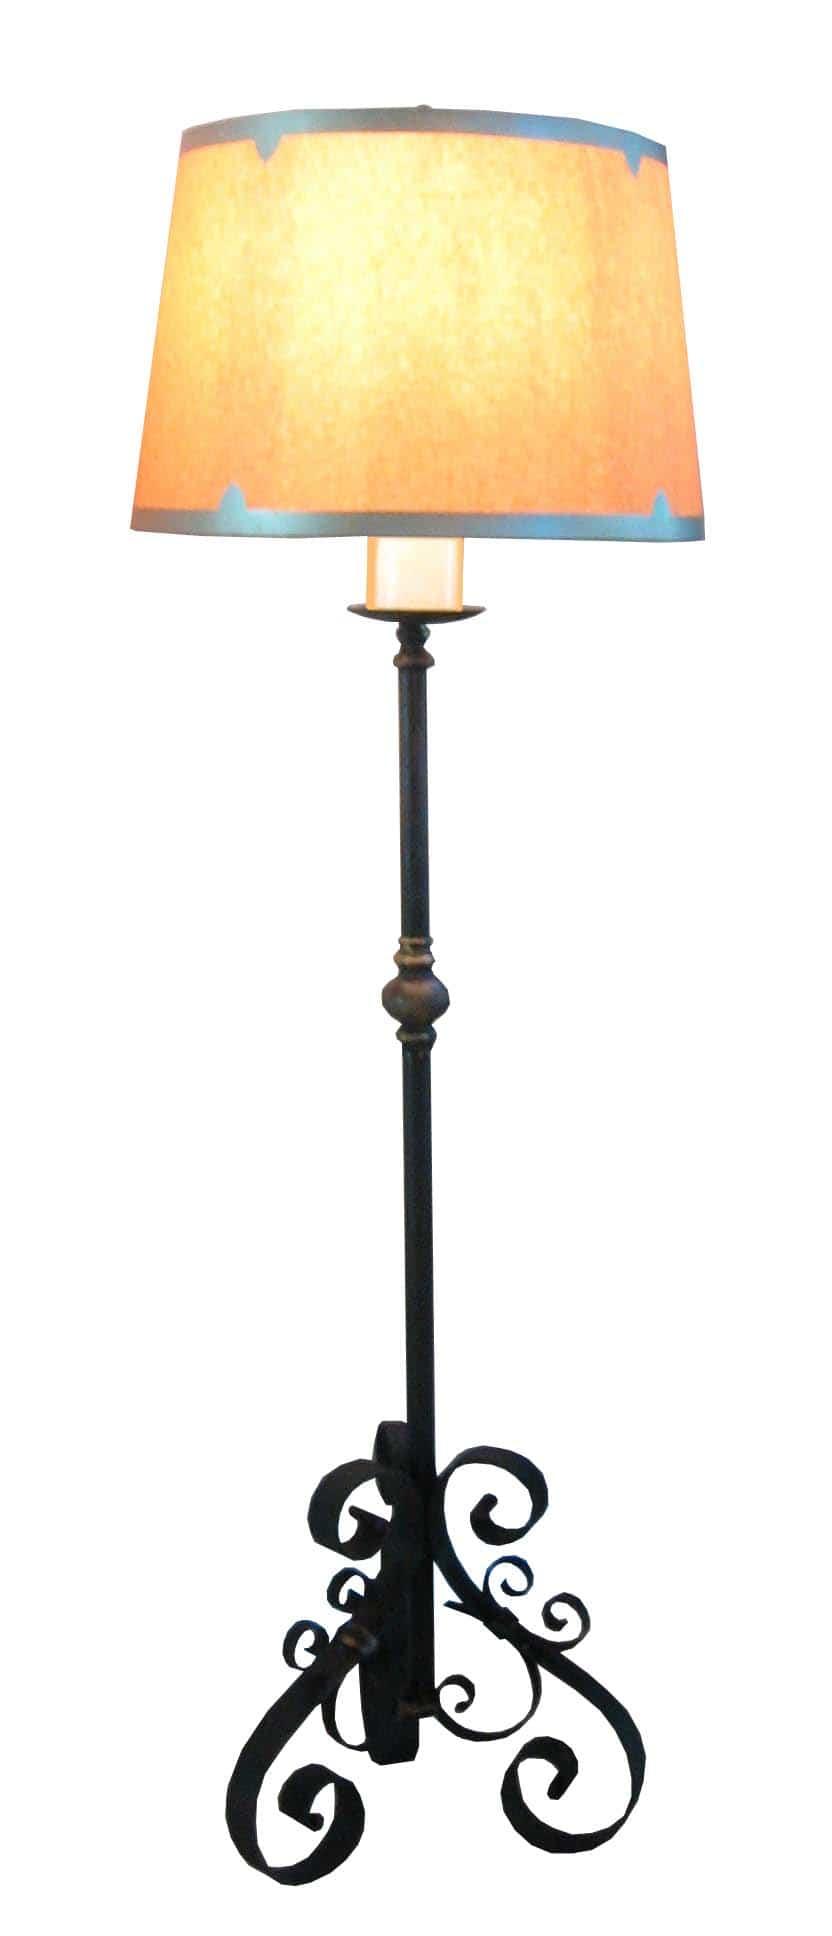 8030 Mb1 Ir L Ba ADG Lighting Hearst Castle 17th Century Monastery Altar Floor Lamp – ADG Lighting